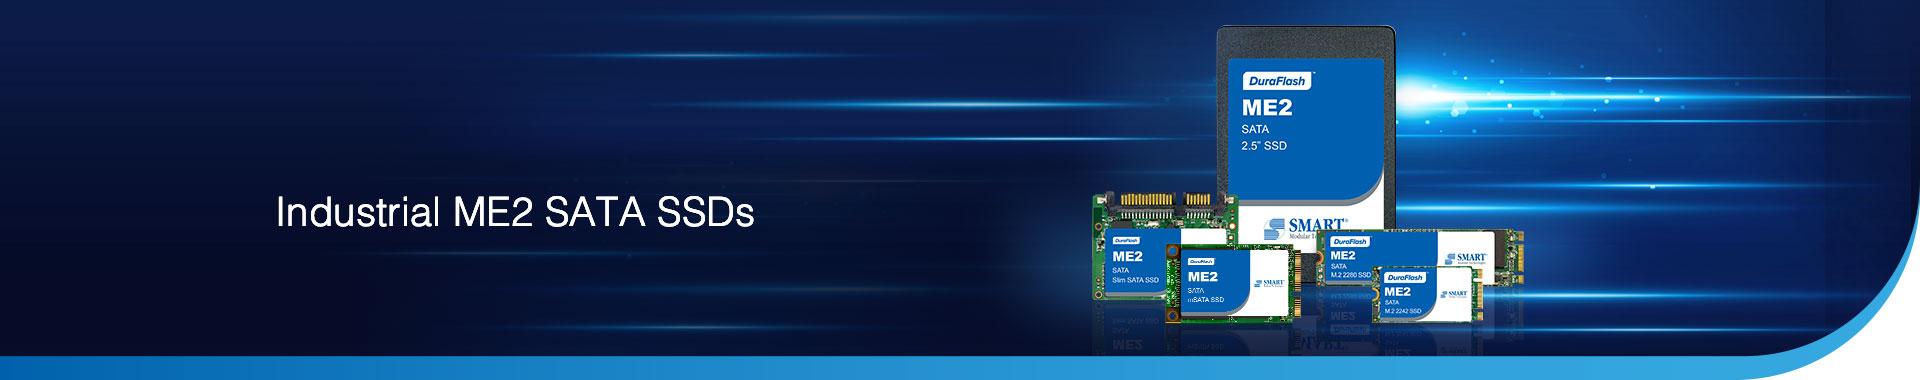 SMART_Industrial_ME2_SATA_SSD_Industrial_SSD